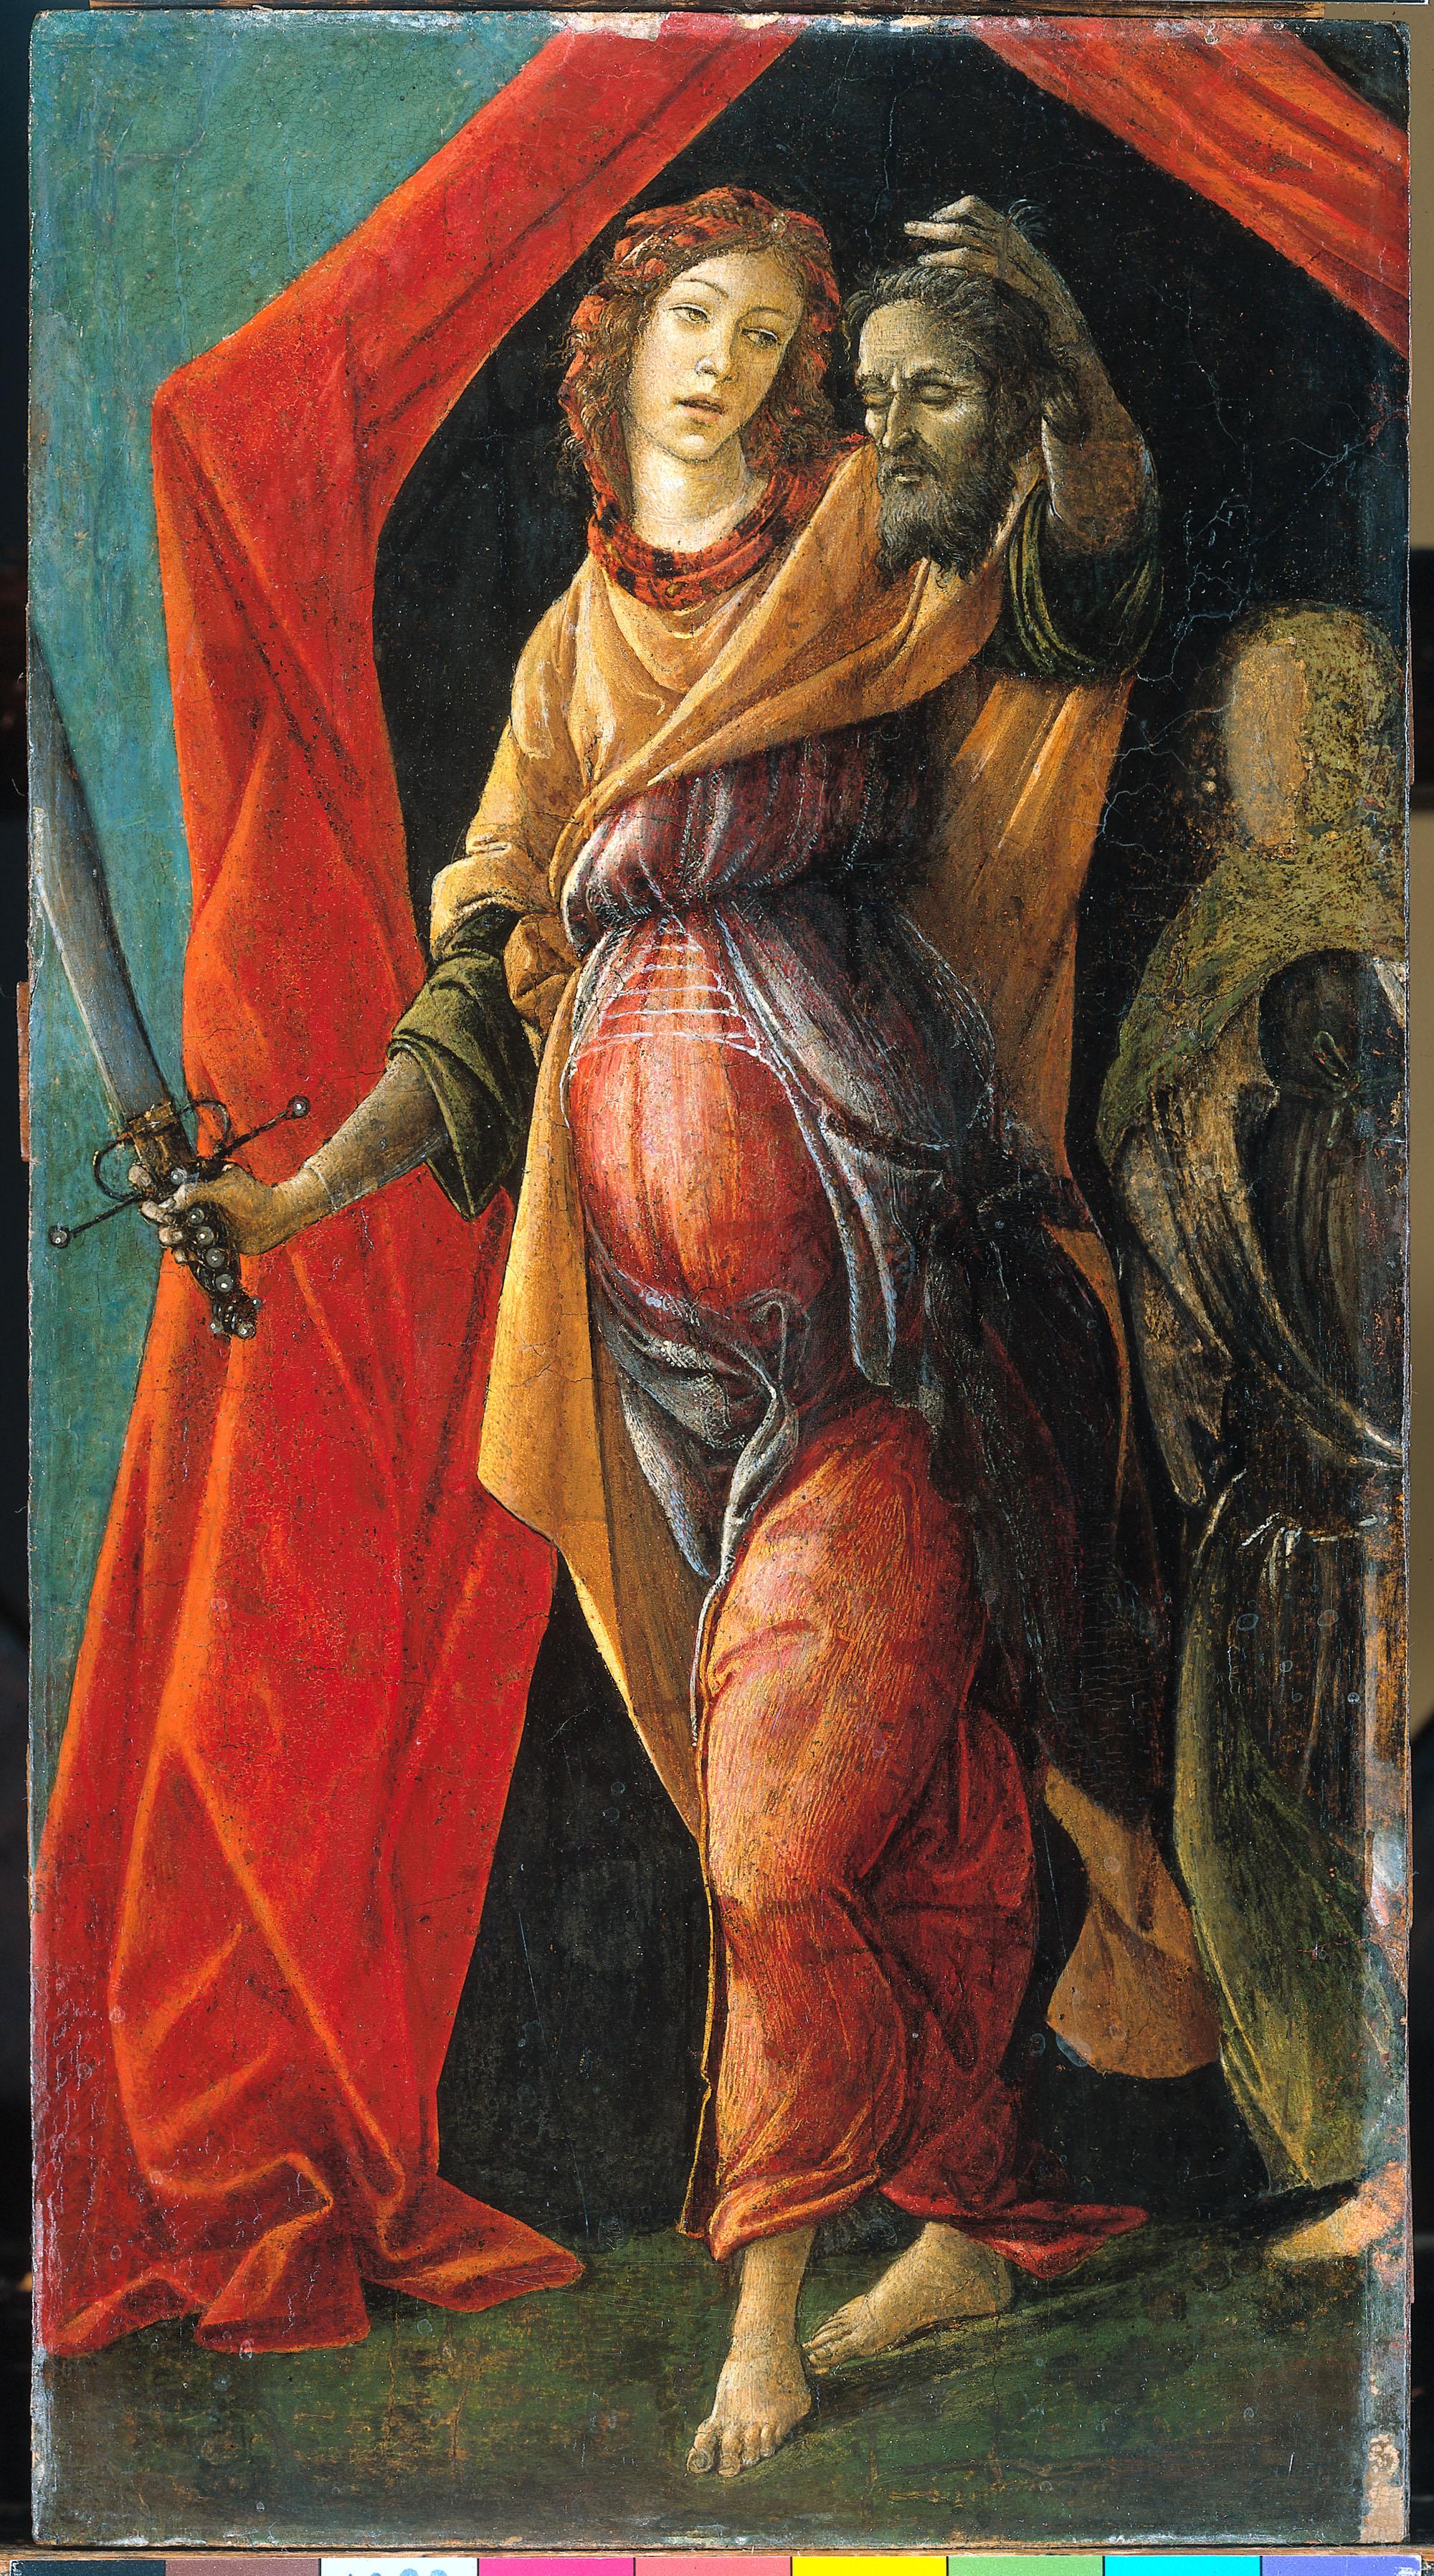 http://upload.wikimedia.org/wikipedia/commons/c/c3/Botticelli_Rijkmuseum_80.jpg